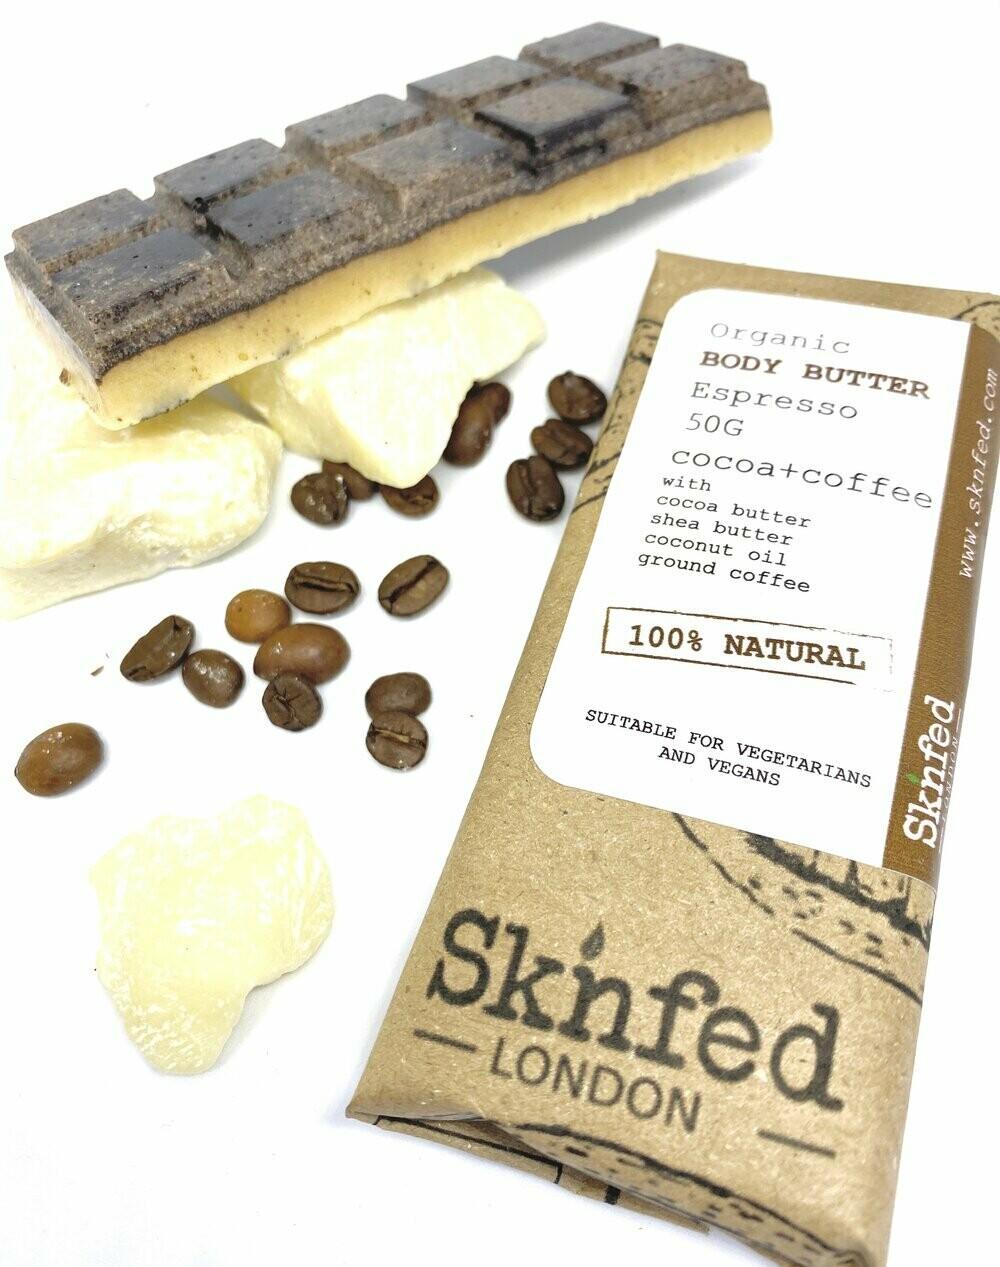 Organic Body Butter-espresso, 50g